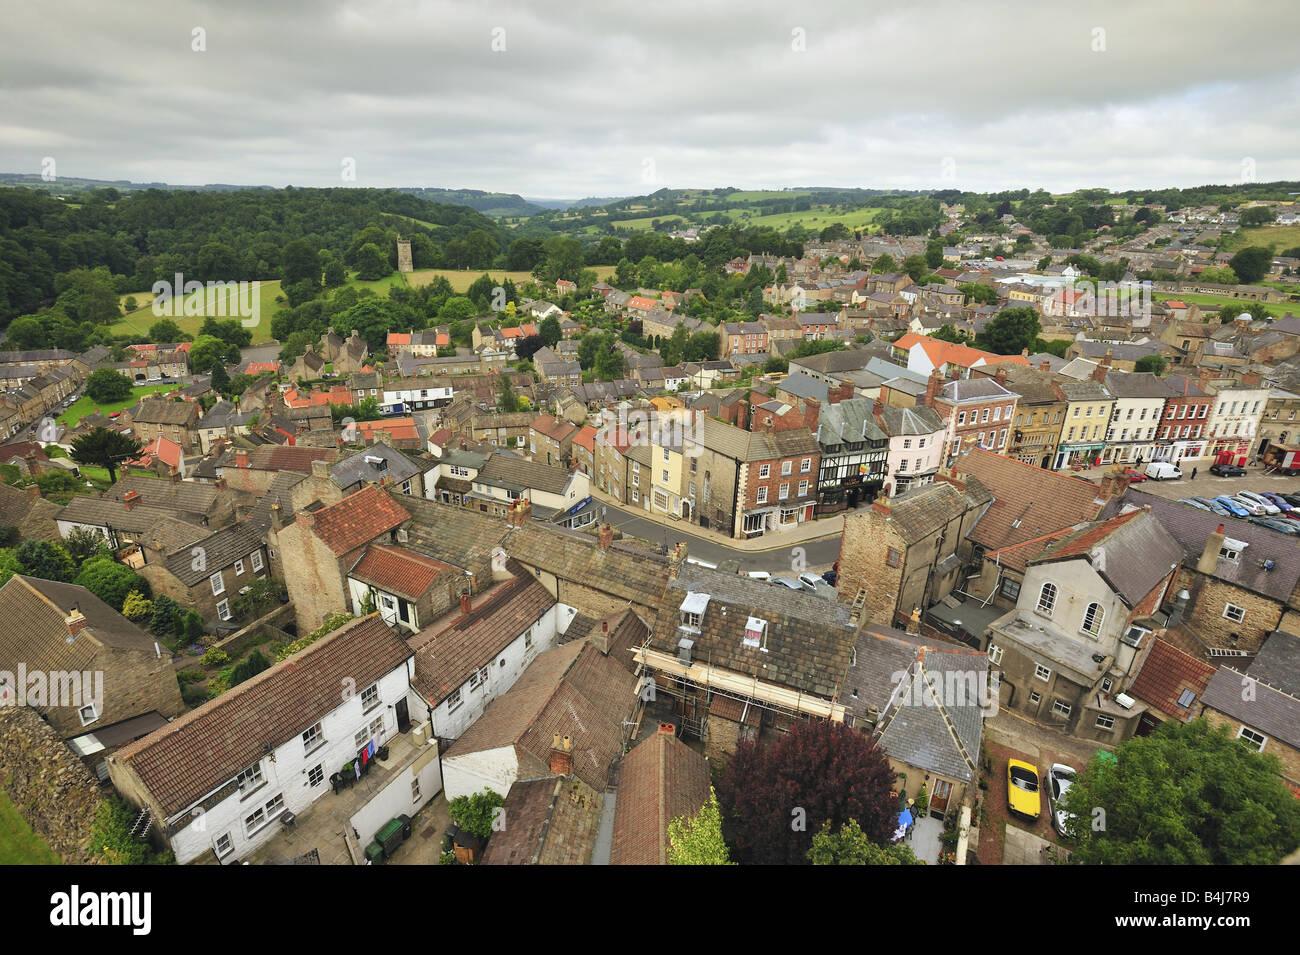 Richmond, Yorkshire. - Stock Image